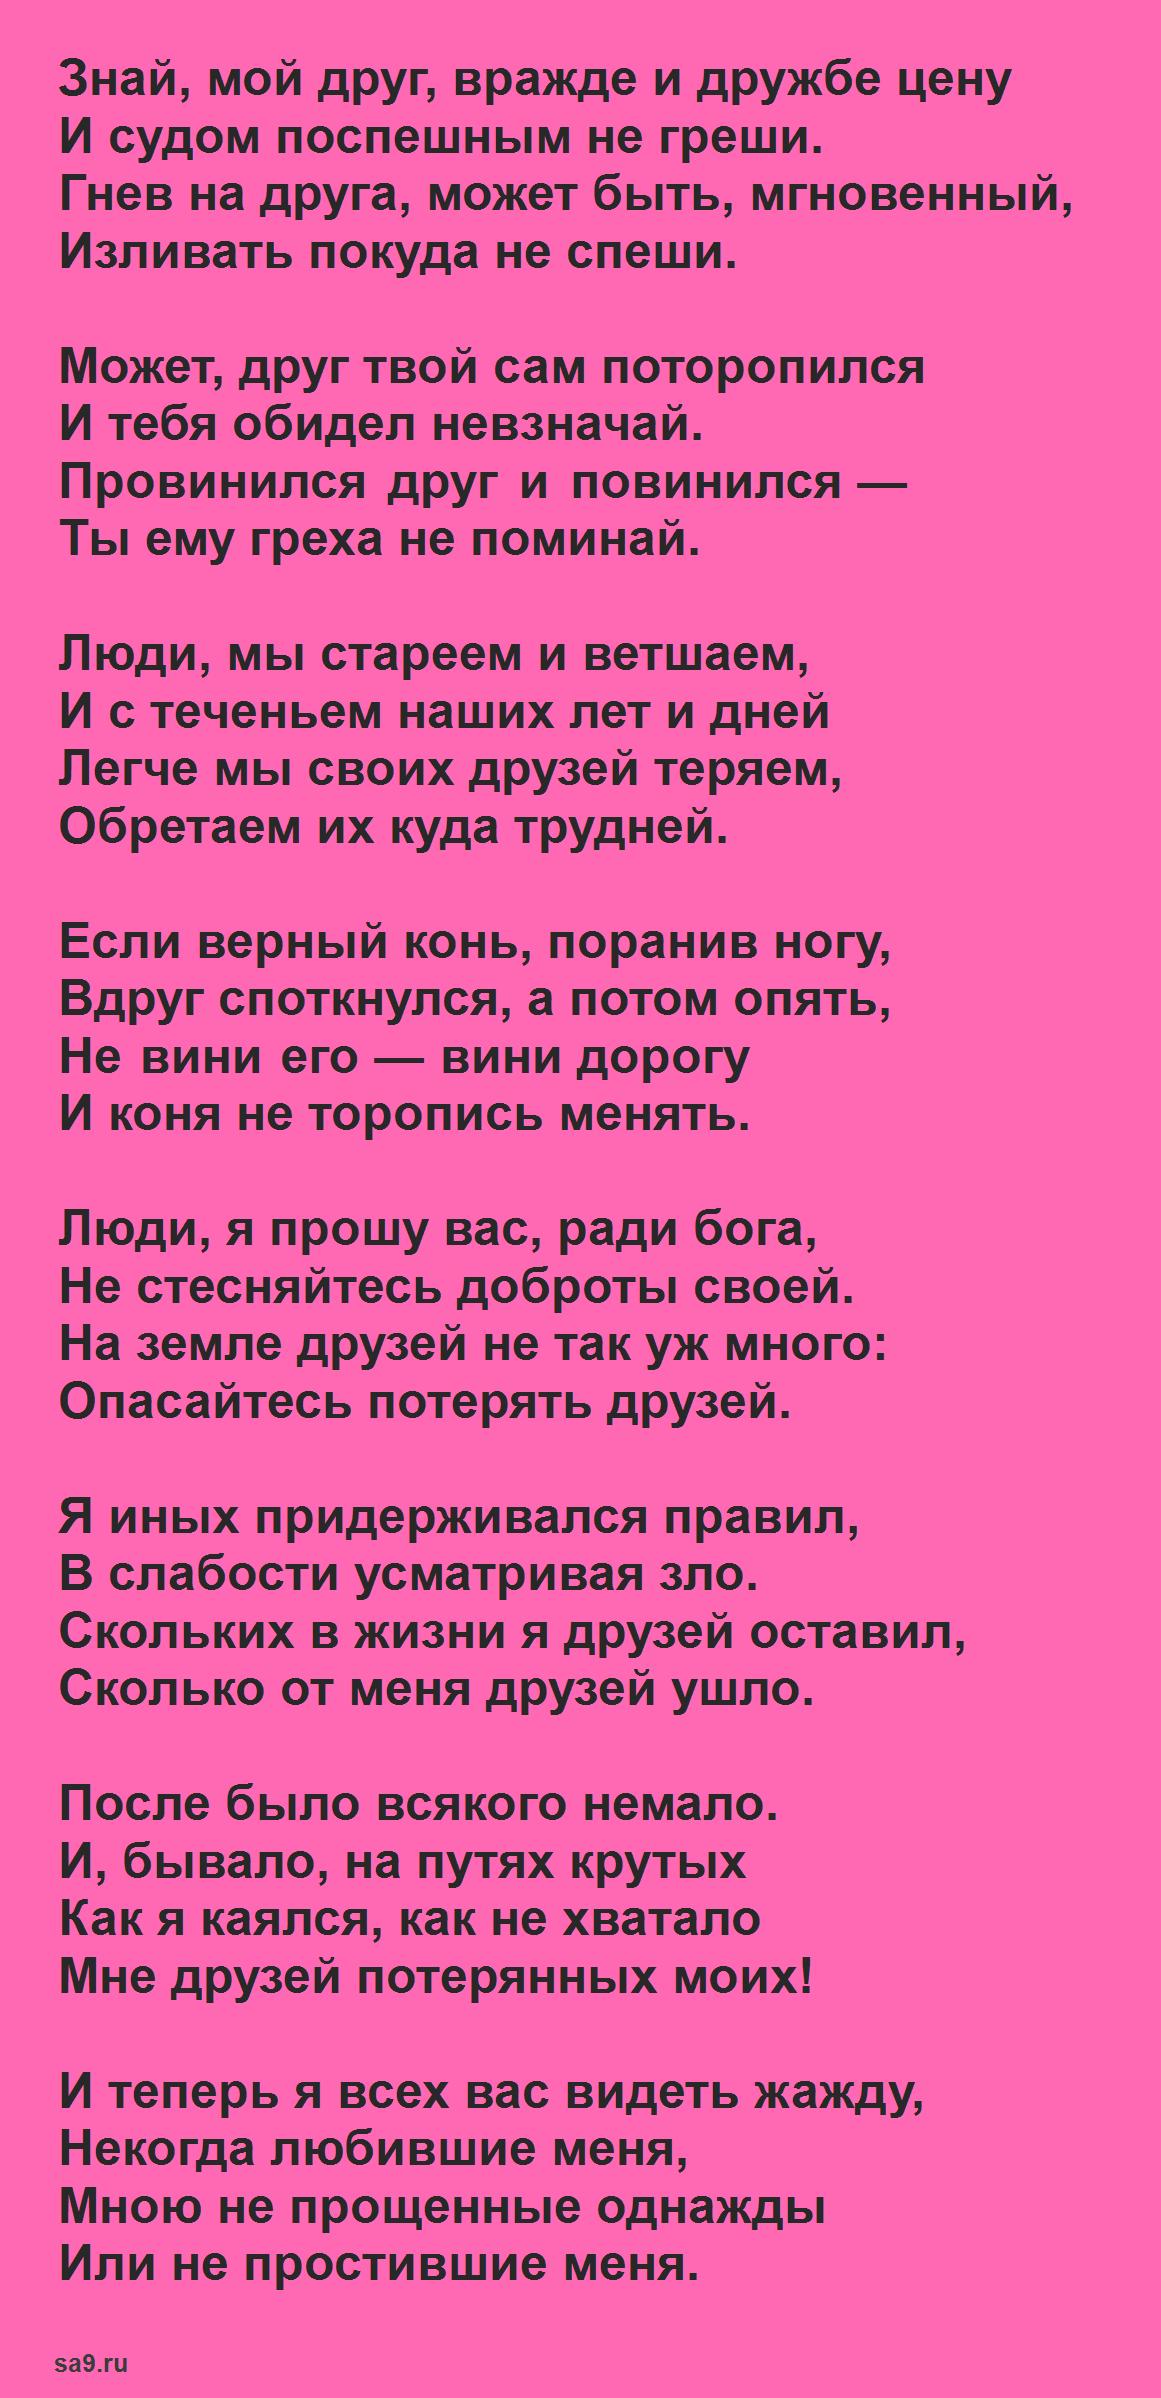 Песни на стихи Гамзатова - Берегите друзей